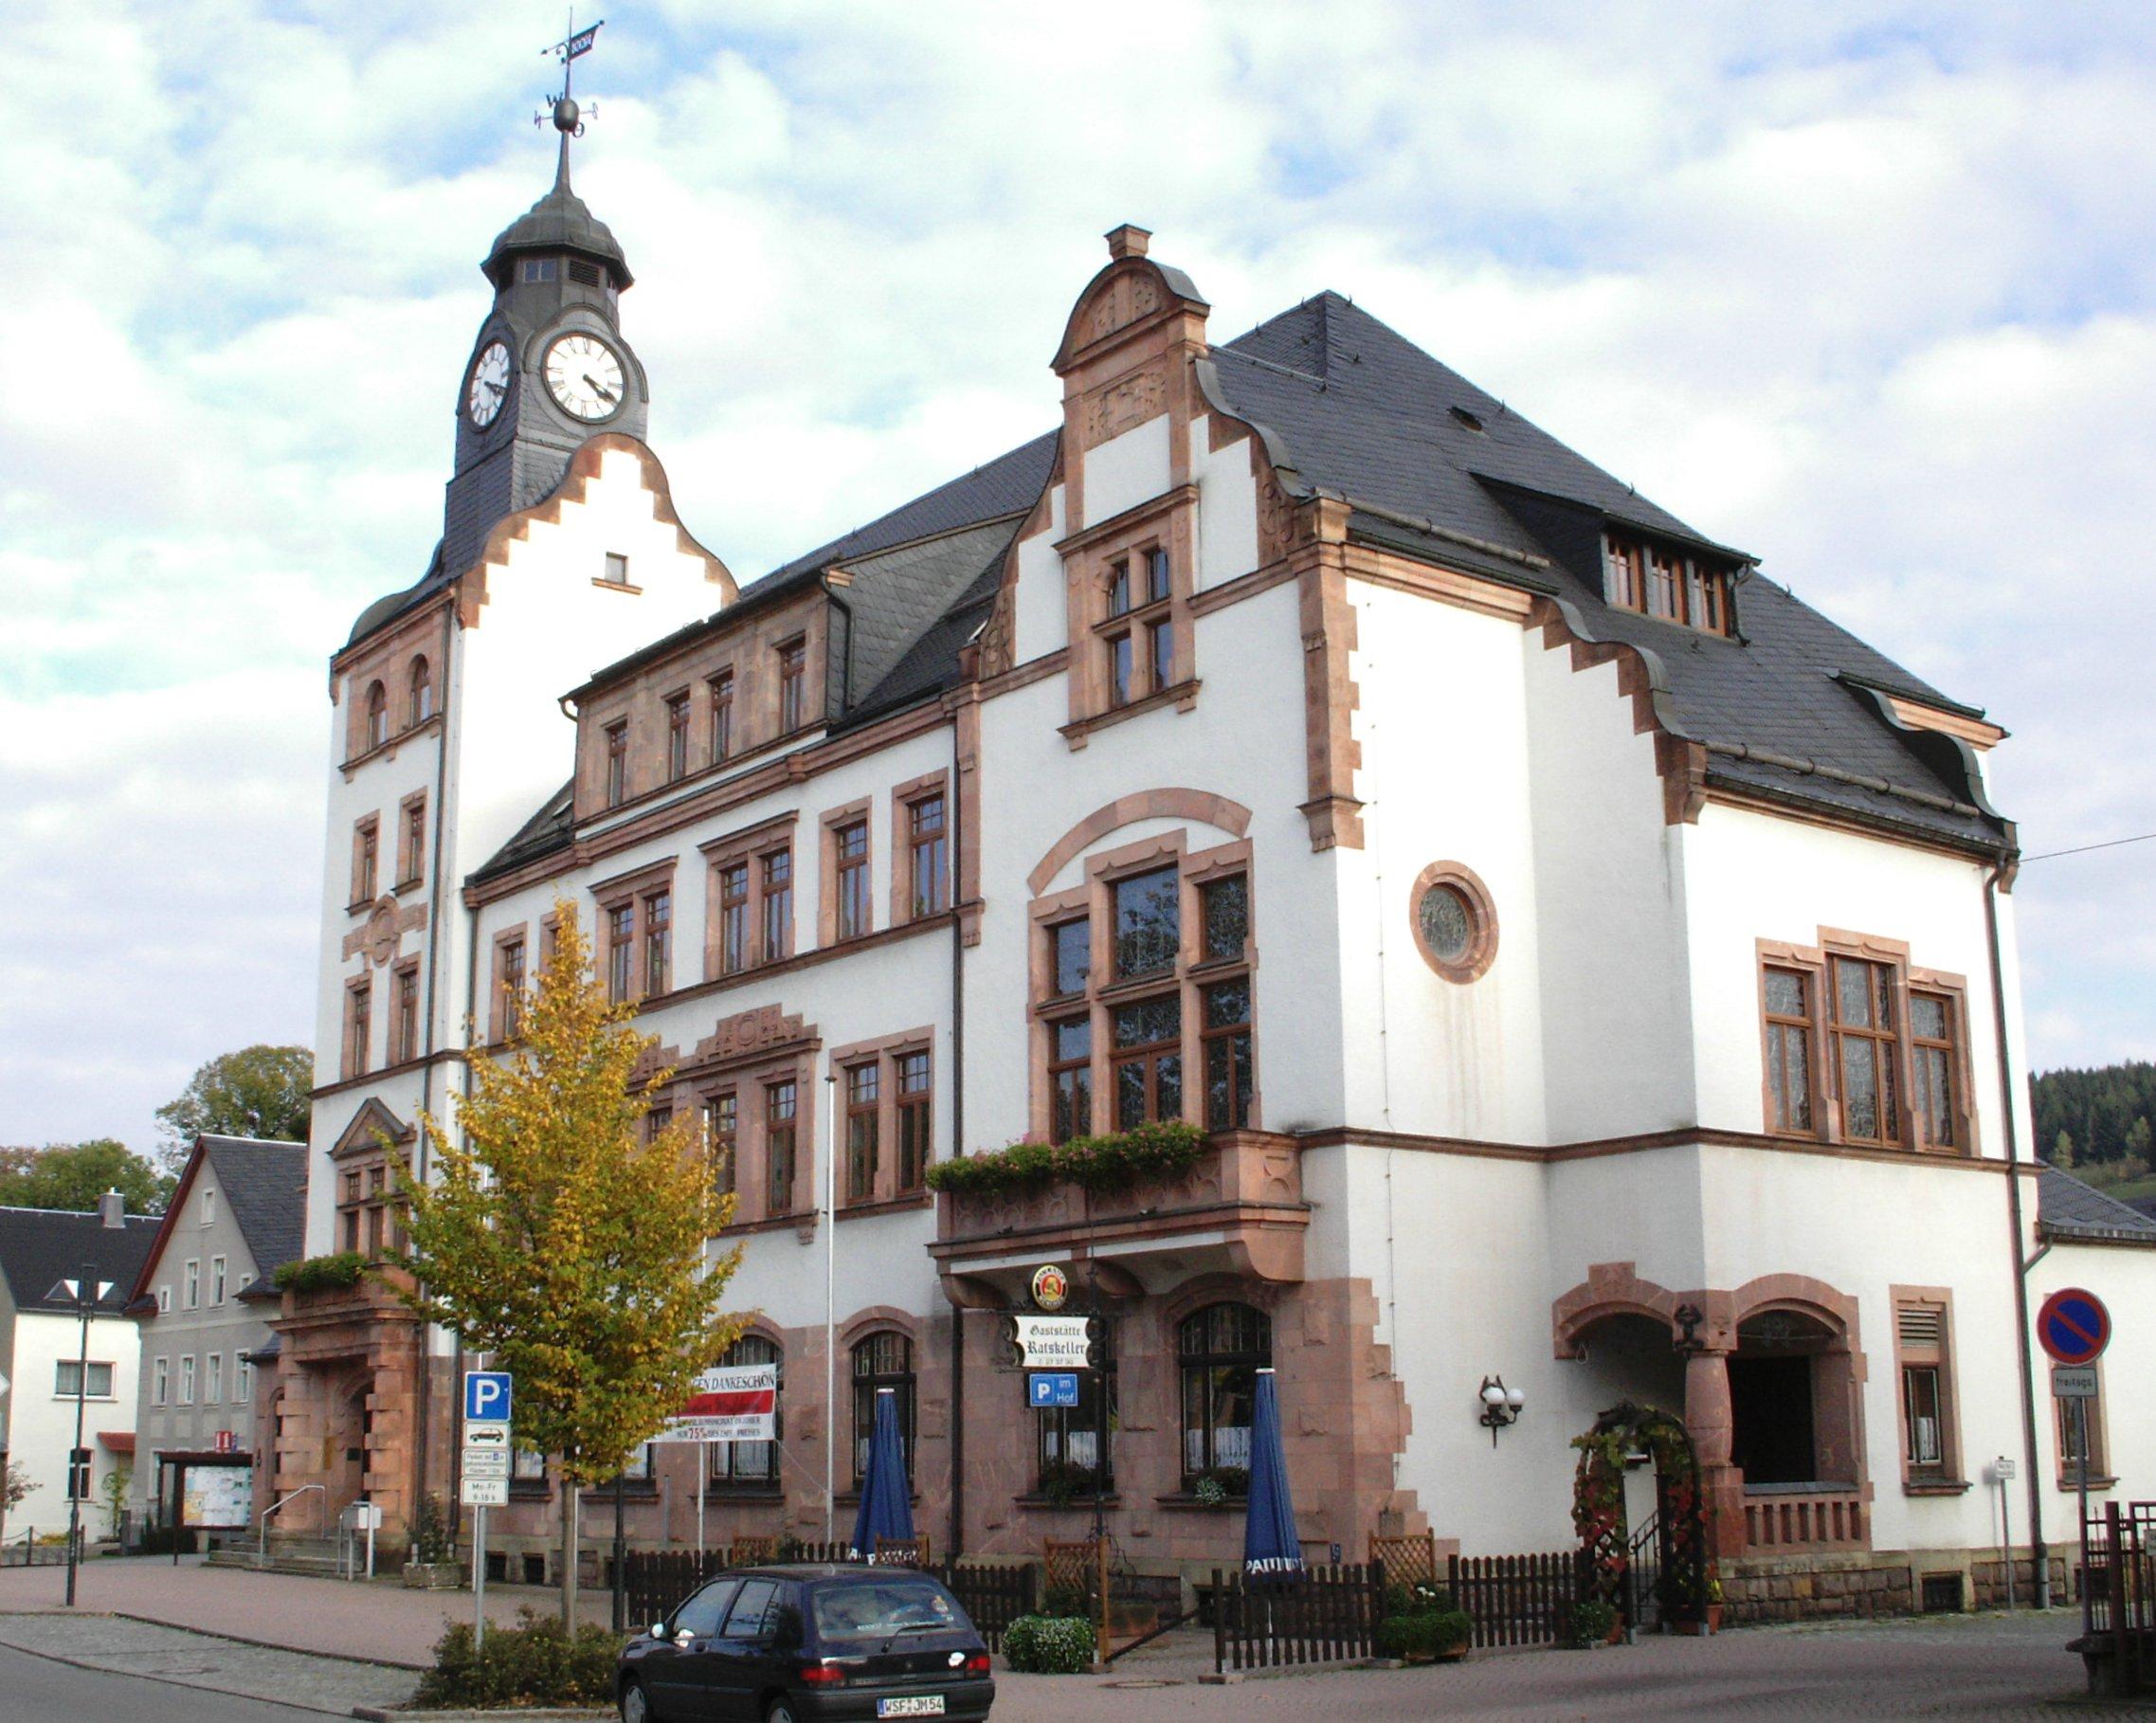 Thalheim, Saxony